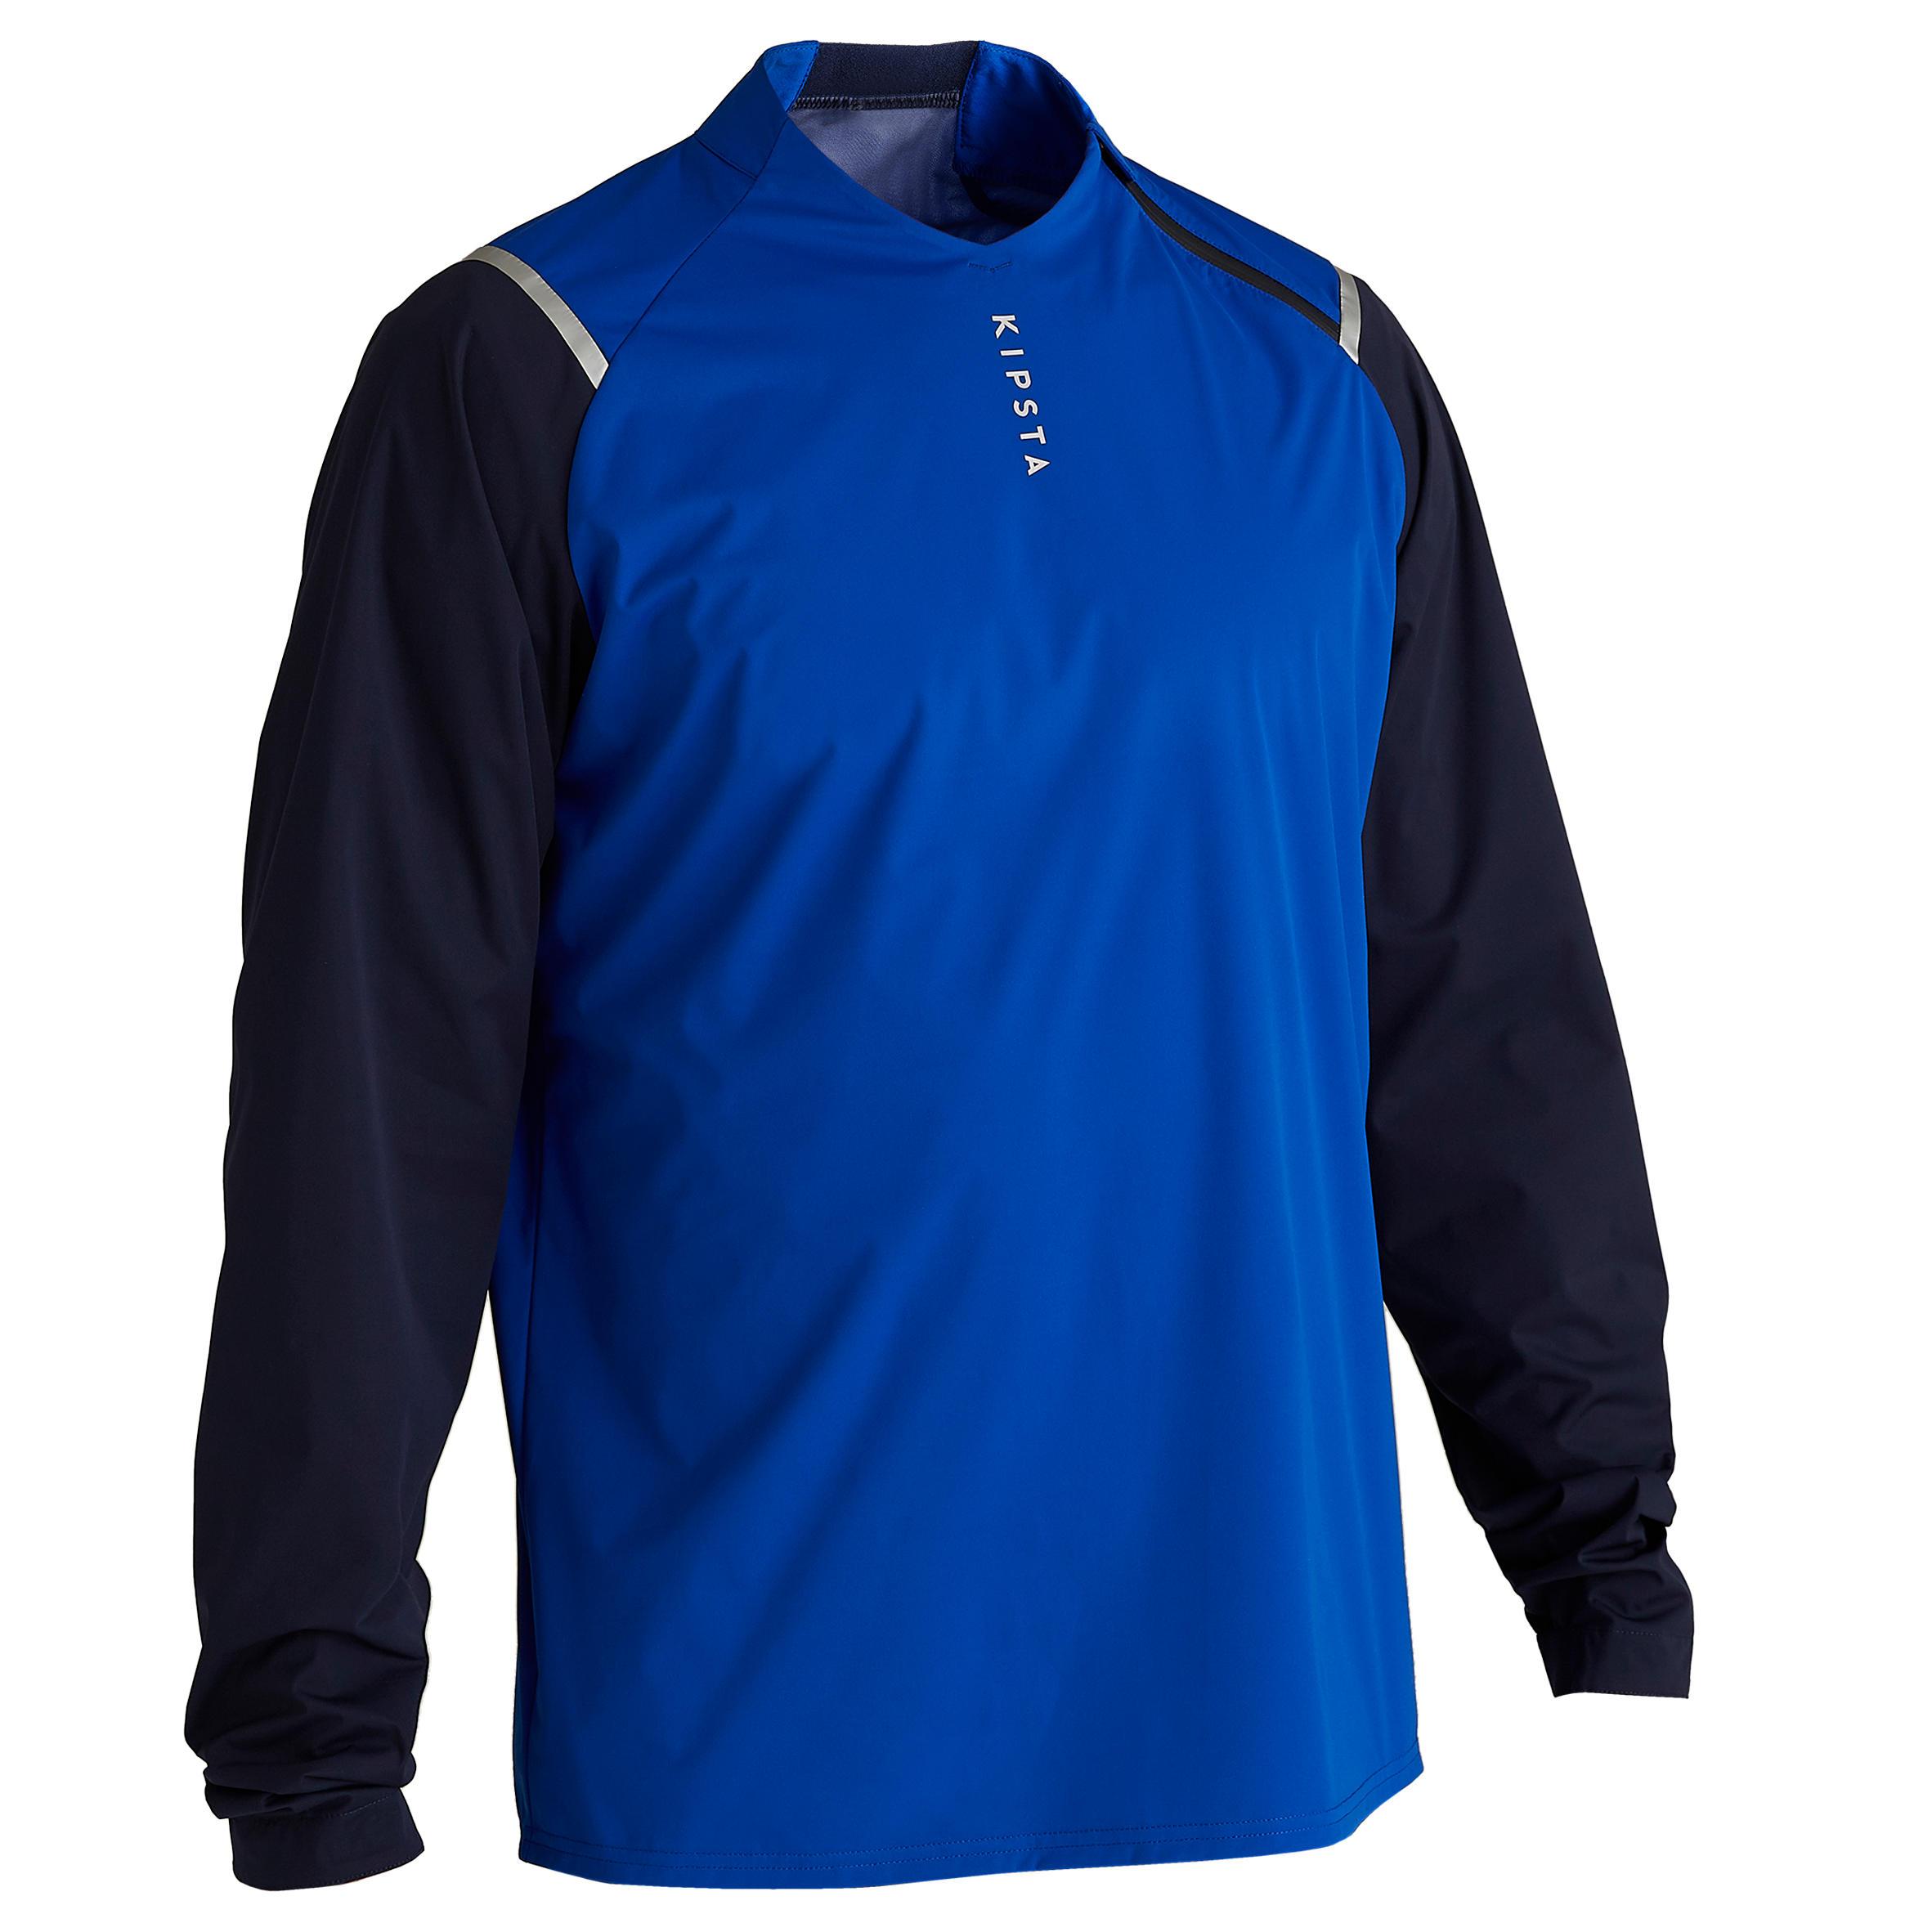 Sweatshirt T500 wasserdicht Erwachsene blau